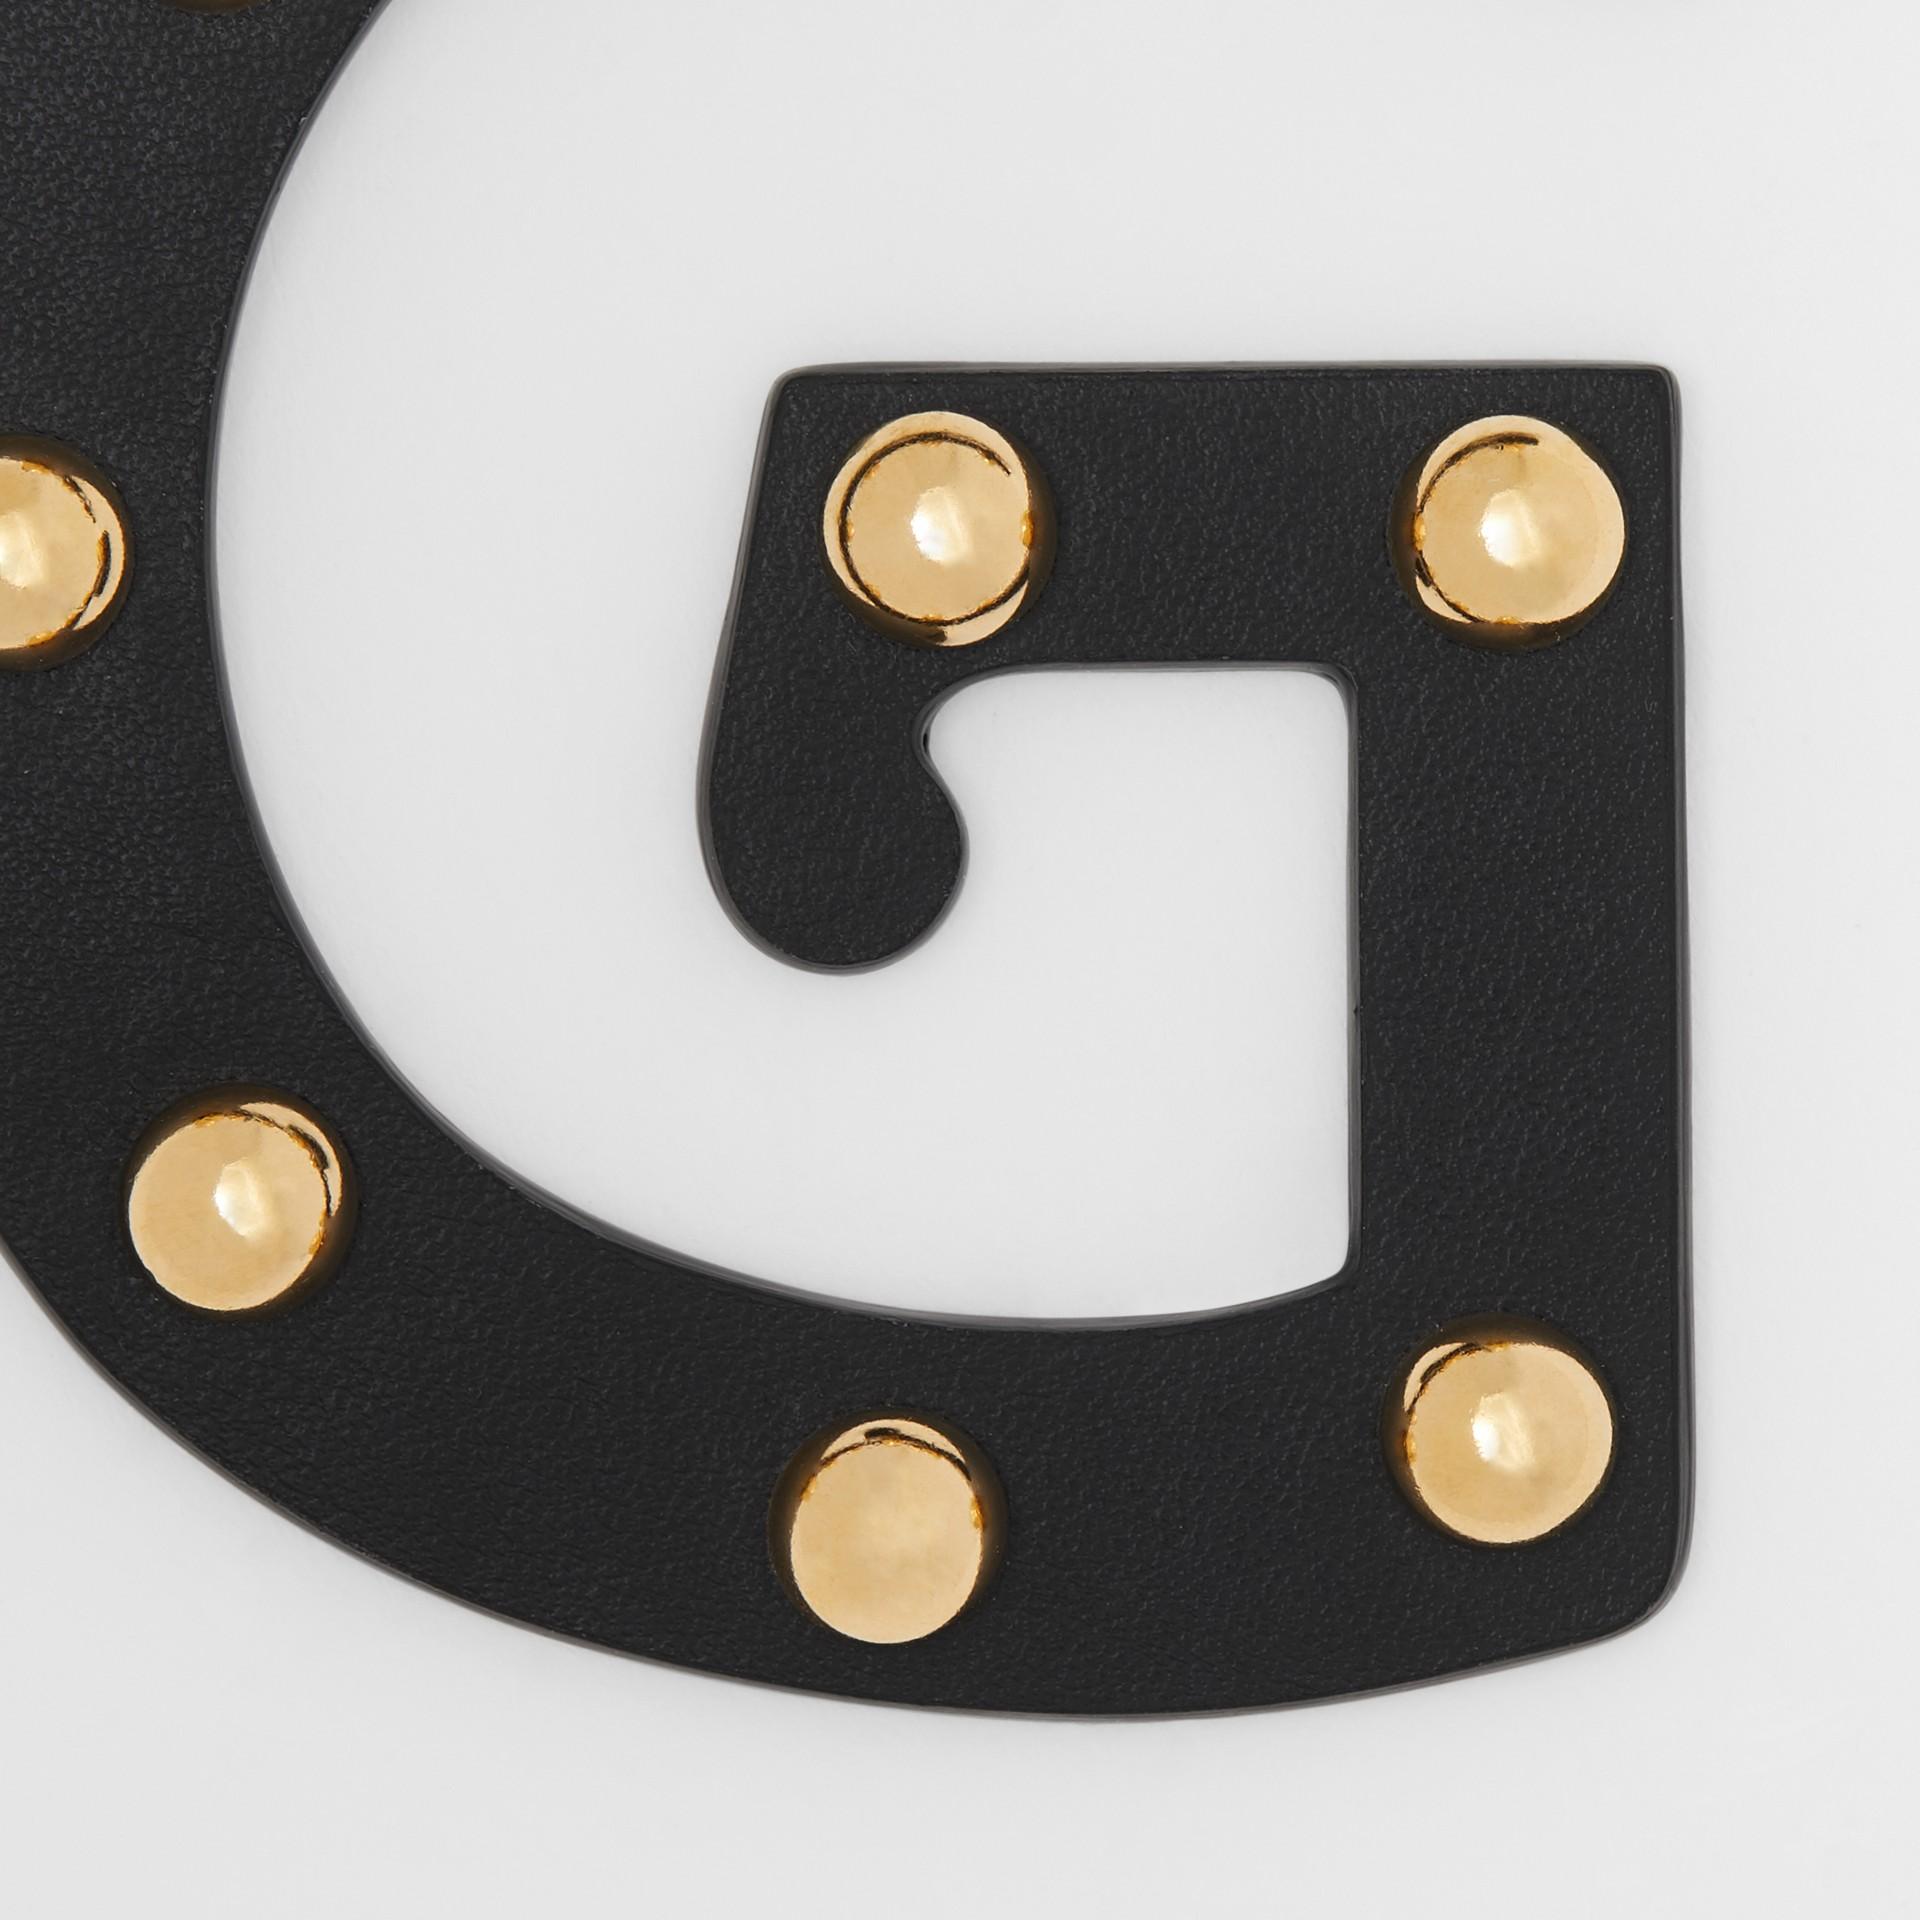 'G' Studded Leather Alphabet Charm in Black/light Gold - Women | Burberry Australia - gallery image 1